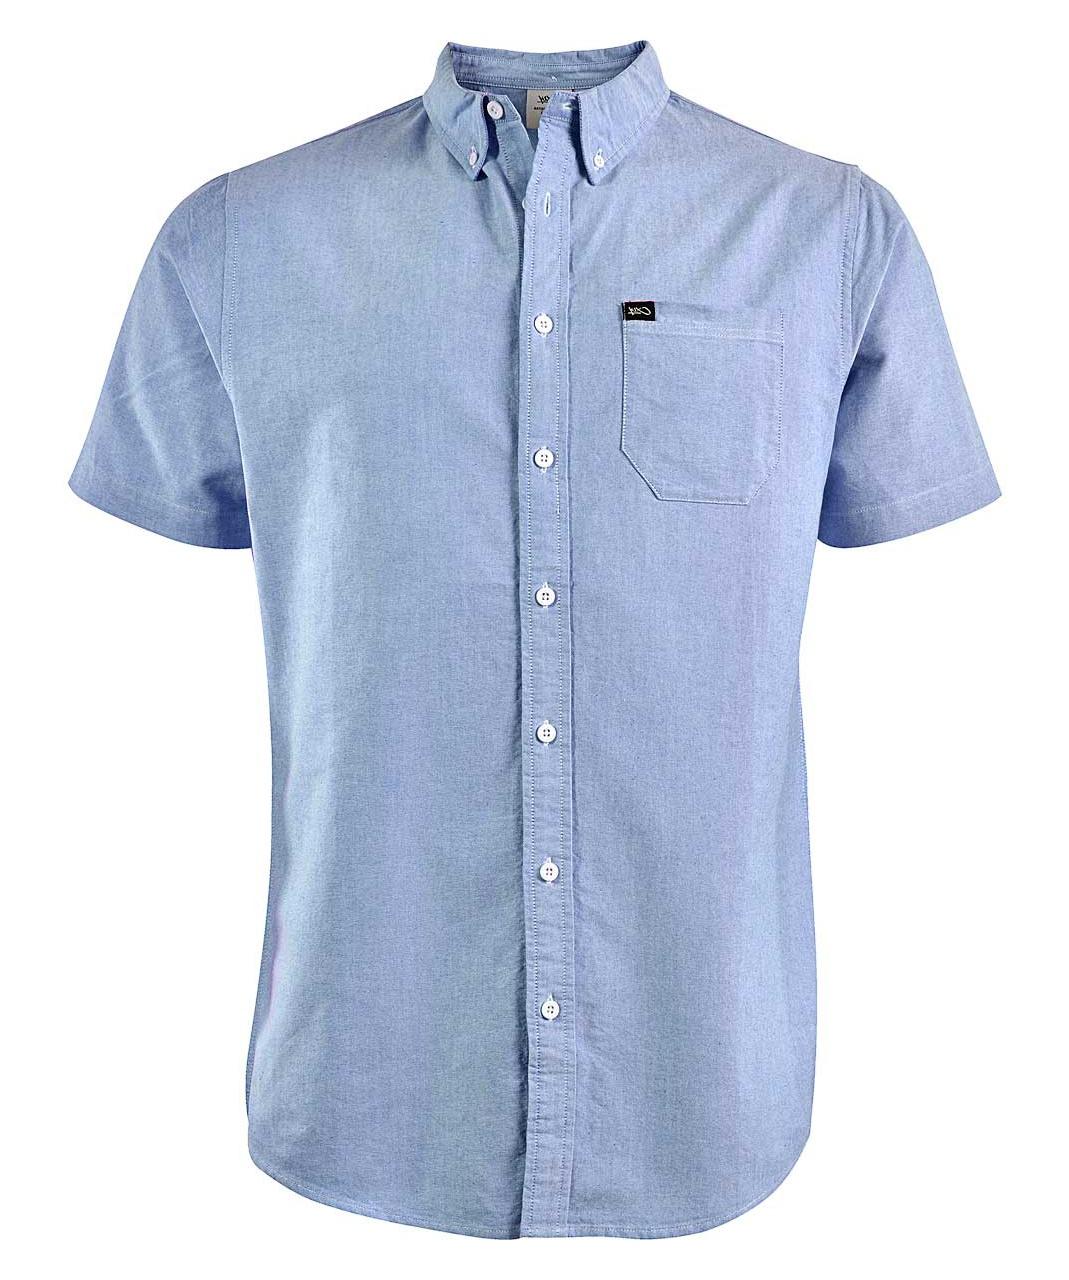 پیراهن مردانه کی وان ایکس مدل Oxford Short Sleeve